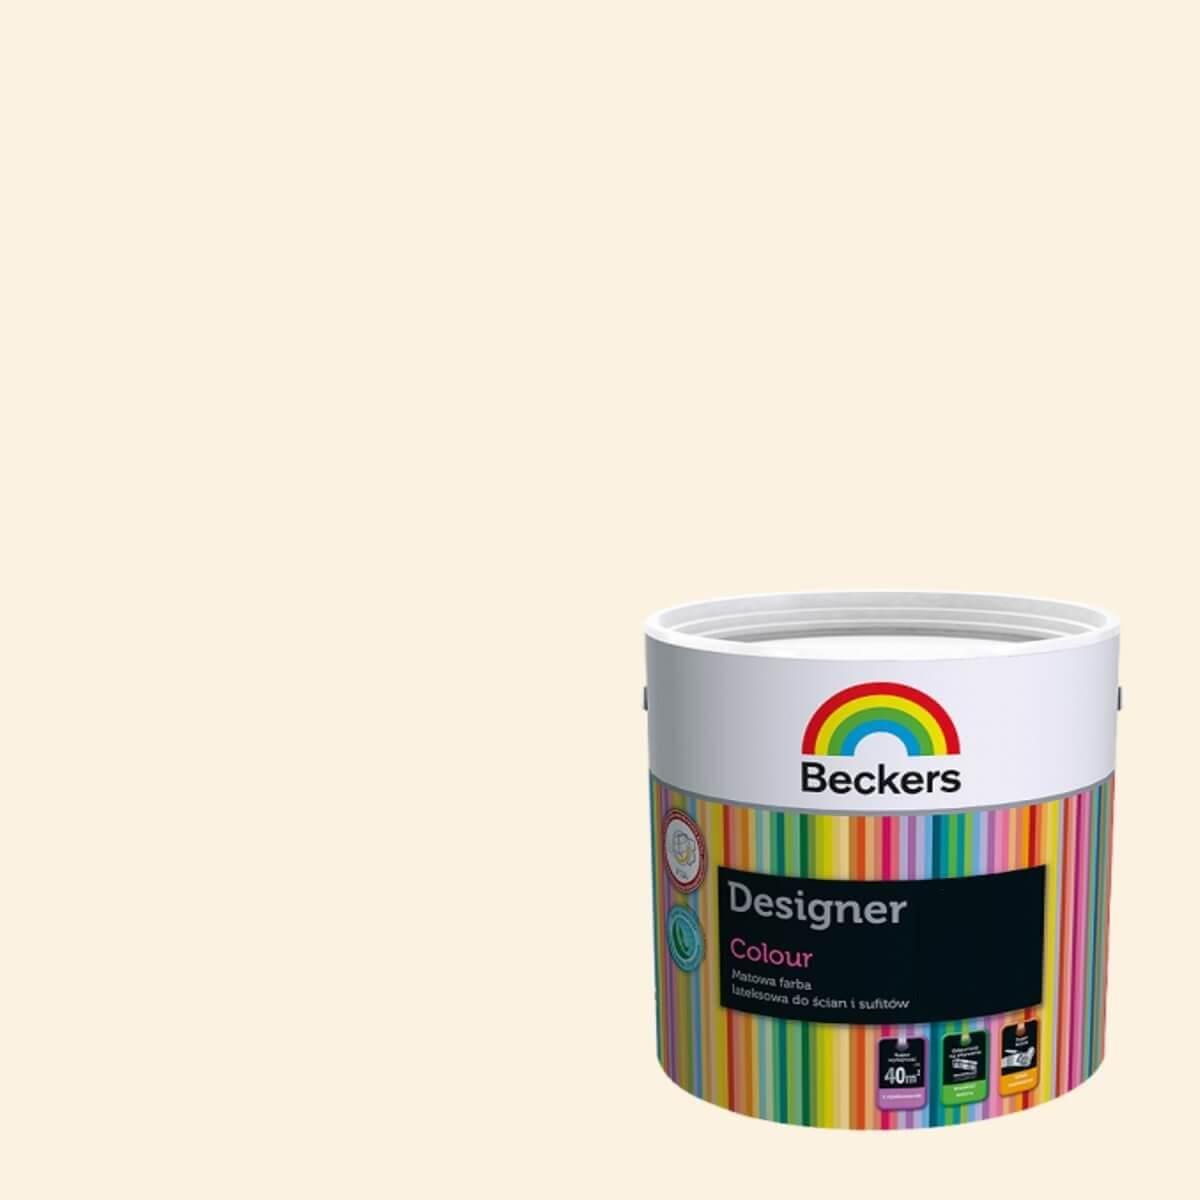 Beckers Farba Lateksowa Designer Colour Sunflower 5l